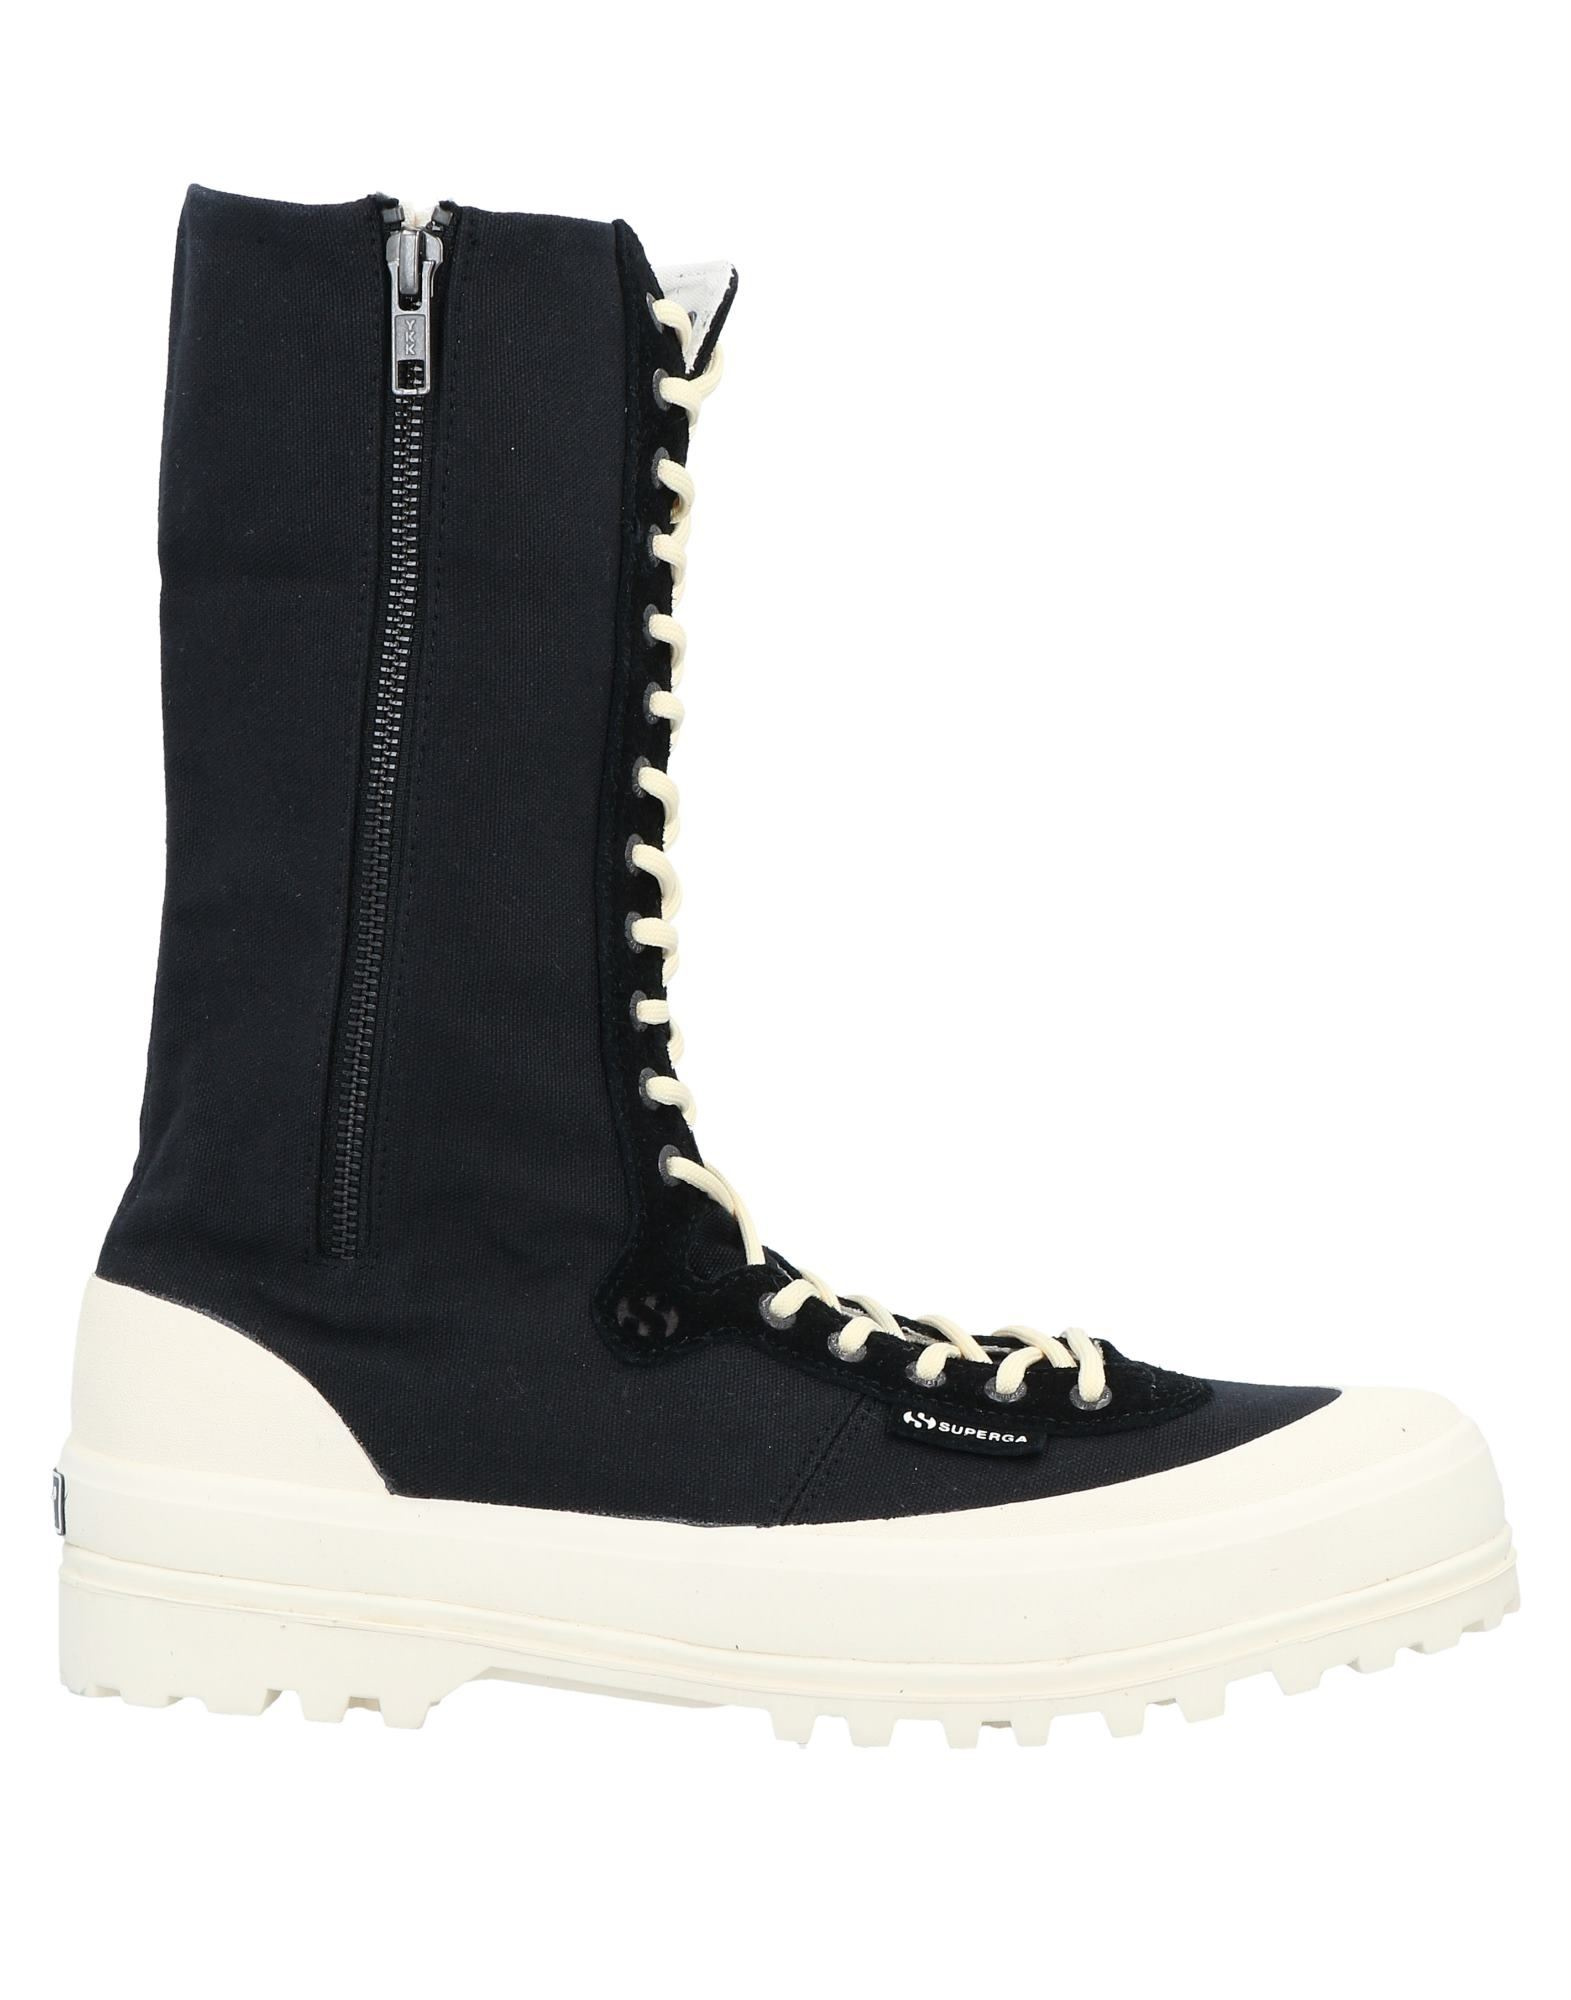 PAURA x SUPERGA  メンズ ブーツ ブラック - ホワイト